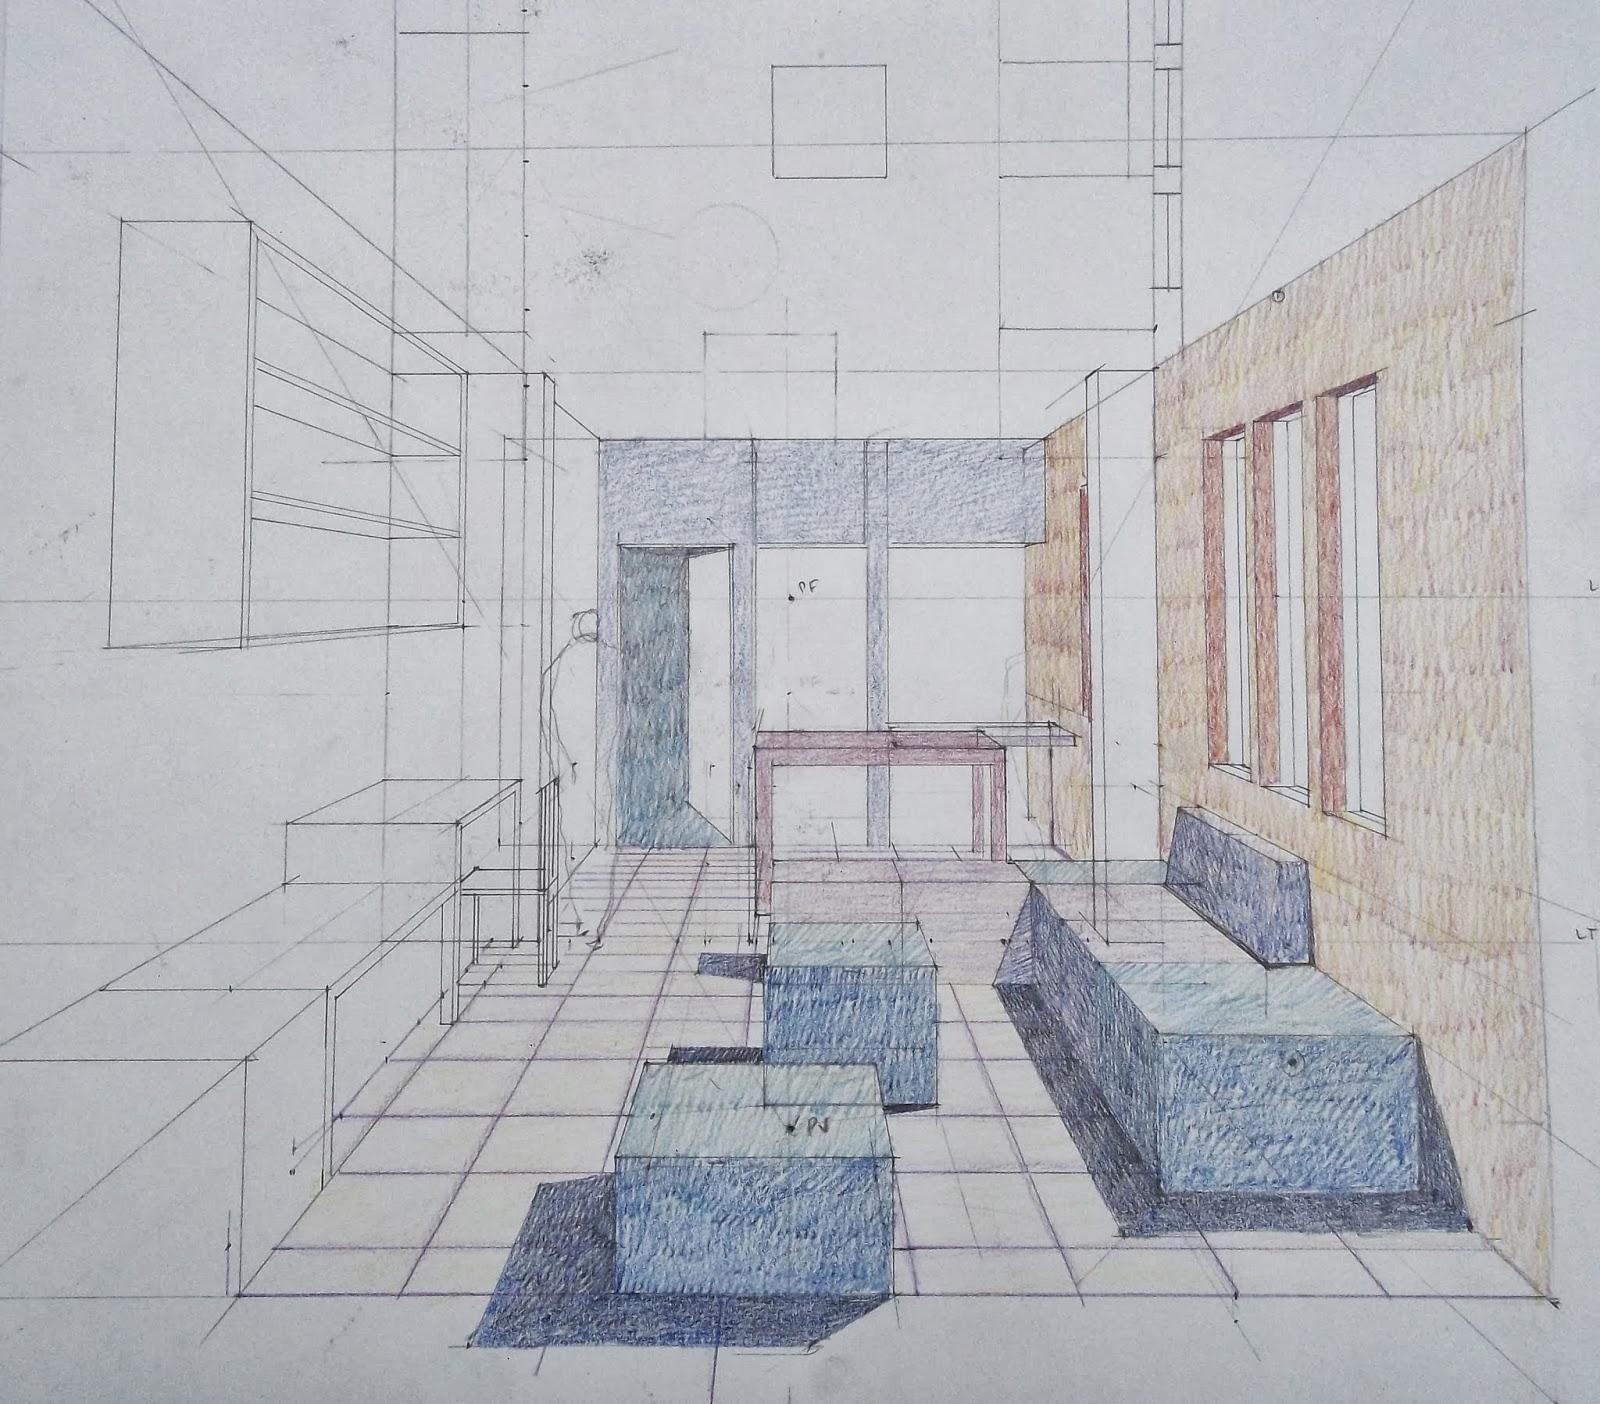 Luis fernando robles m perspectiva de espacio interior for Interior 1 arquitectura